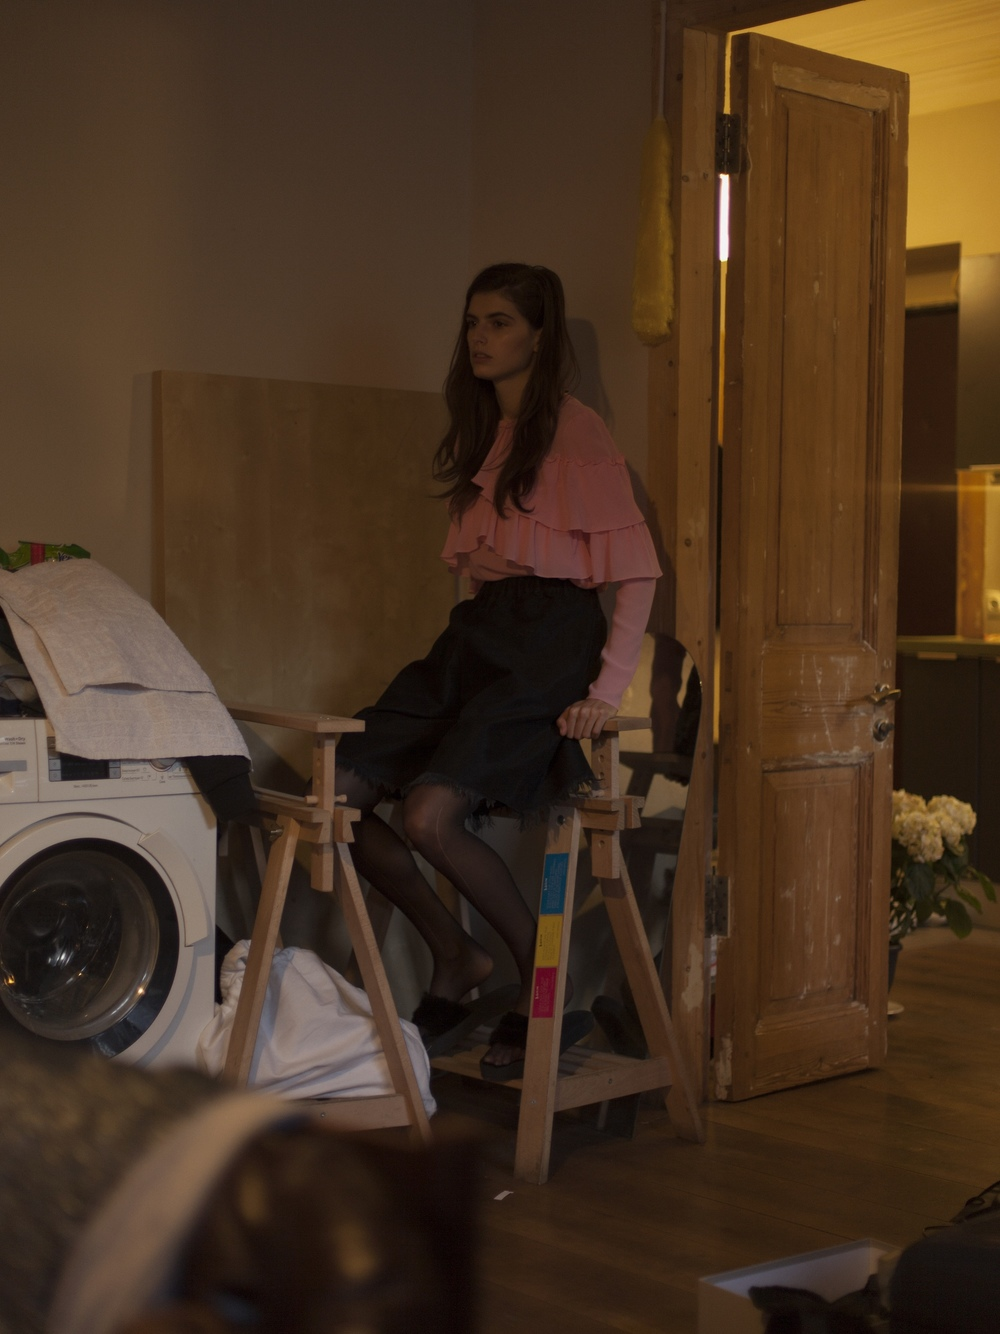 Top YASYA MINOCHKINA, Shirt MARQUES ALMEIDA, Shoes BESSARION